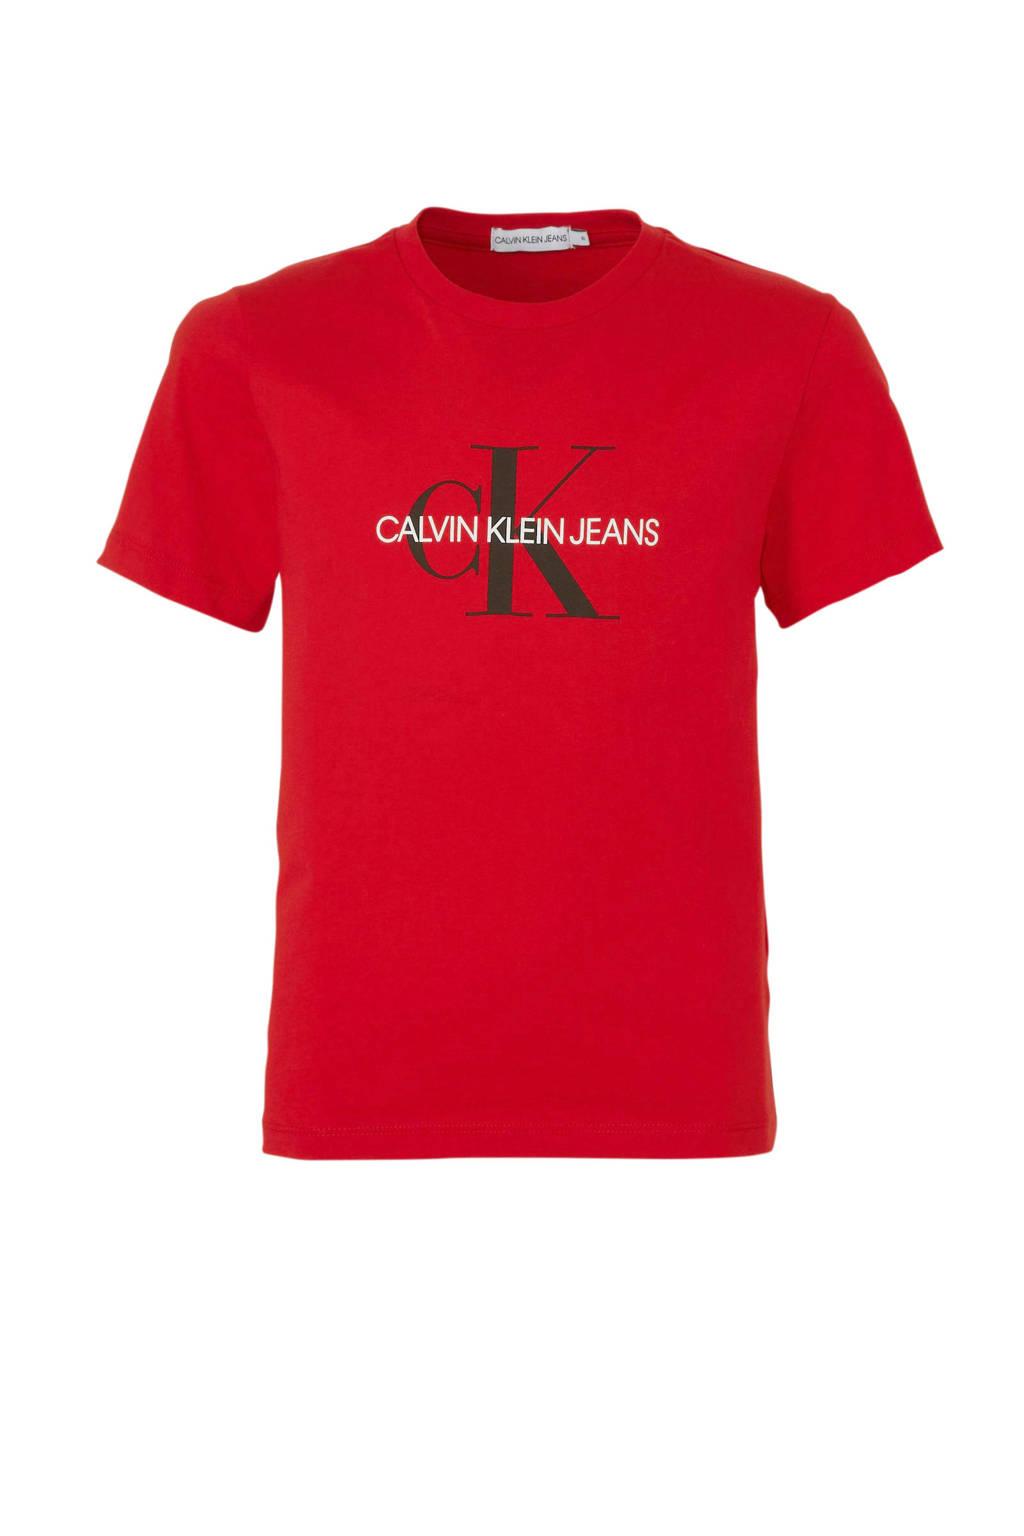 CALVIN KLEIN JEANS T-shirt met logo rood/wit/zwart, Rood/wit/zwart